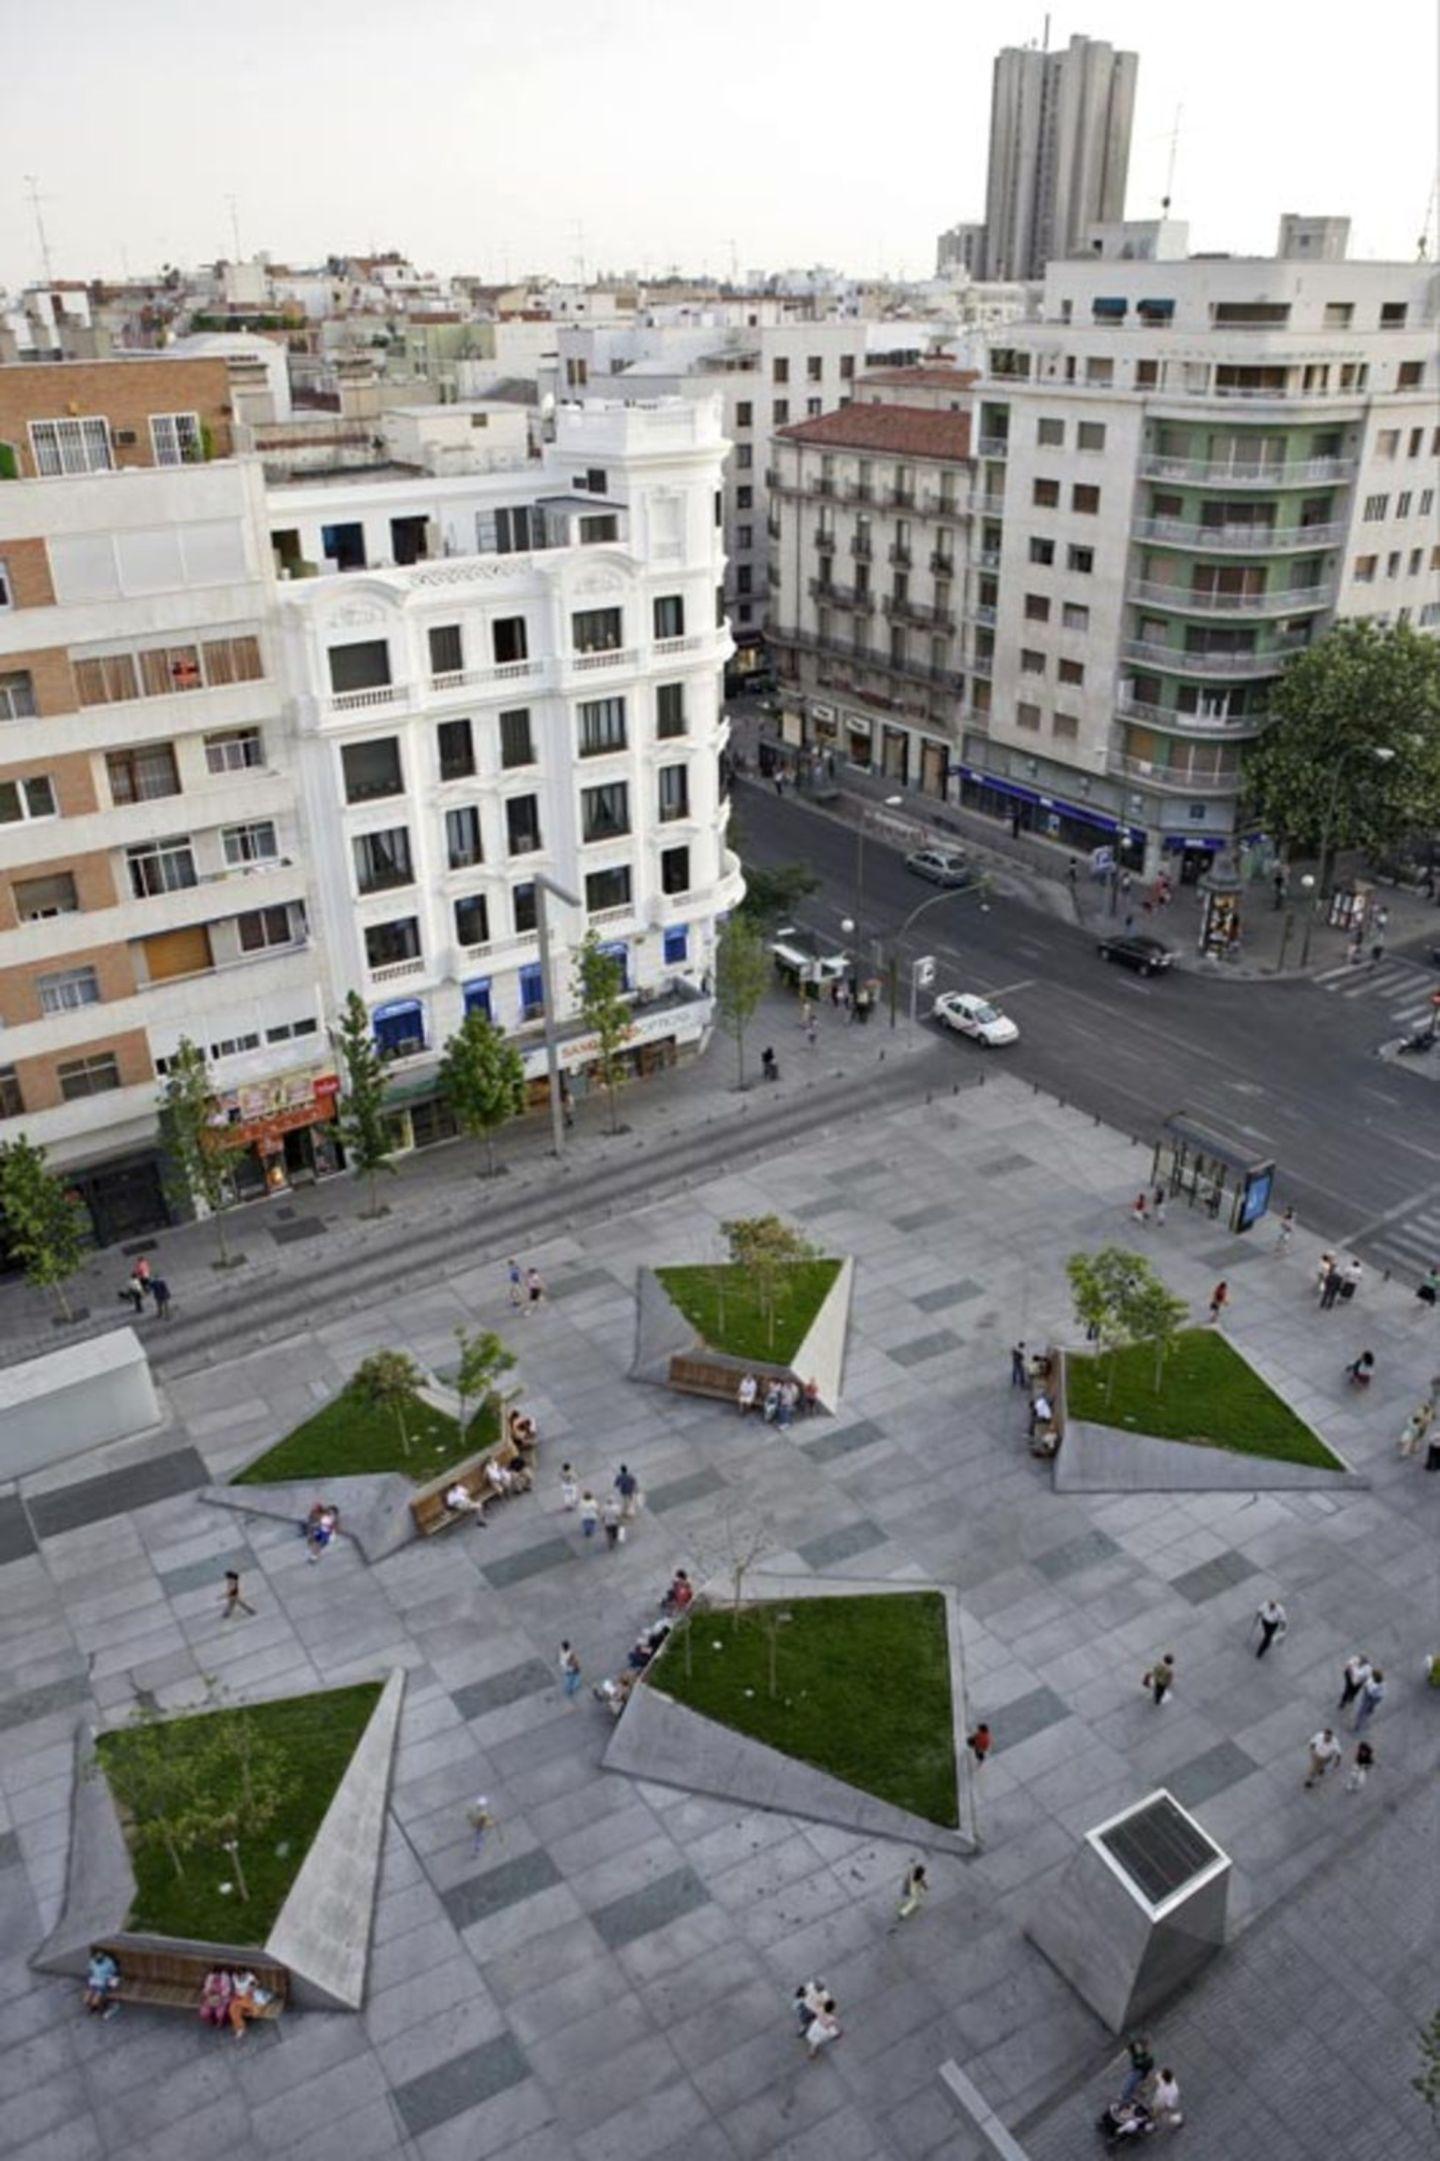 PLAZA DE DALÍ (AVENIDA DE FELIPE II) Rather Than A Square, The Plaza De  Dalí Or Avenida De Felipe II Is A Complex Space Of Great Urban Value In The  Center ...